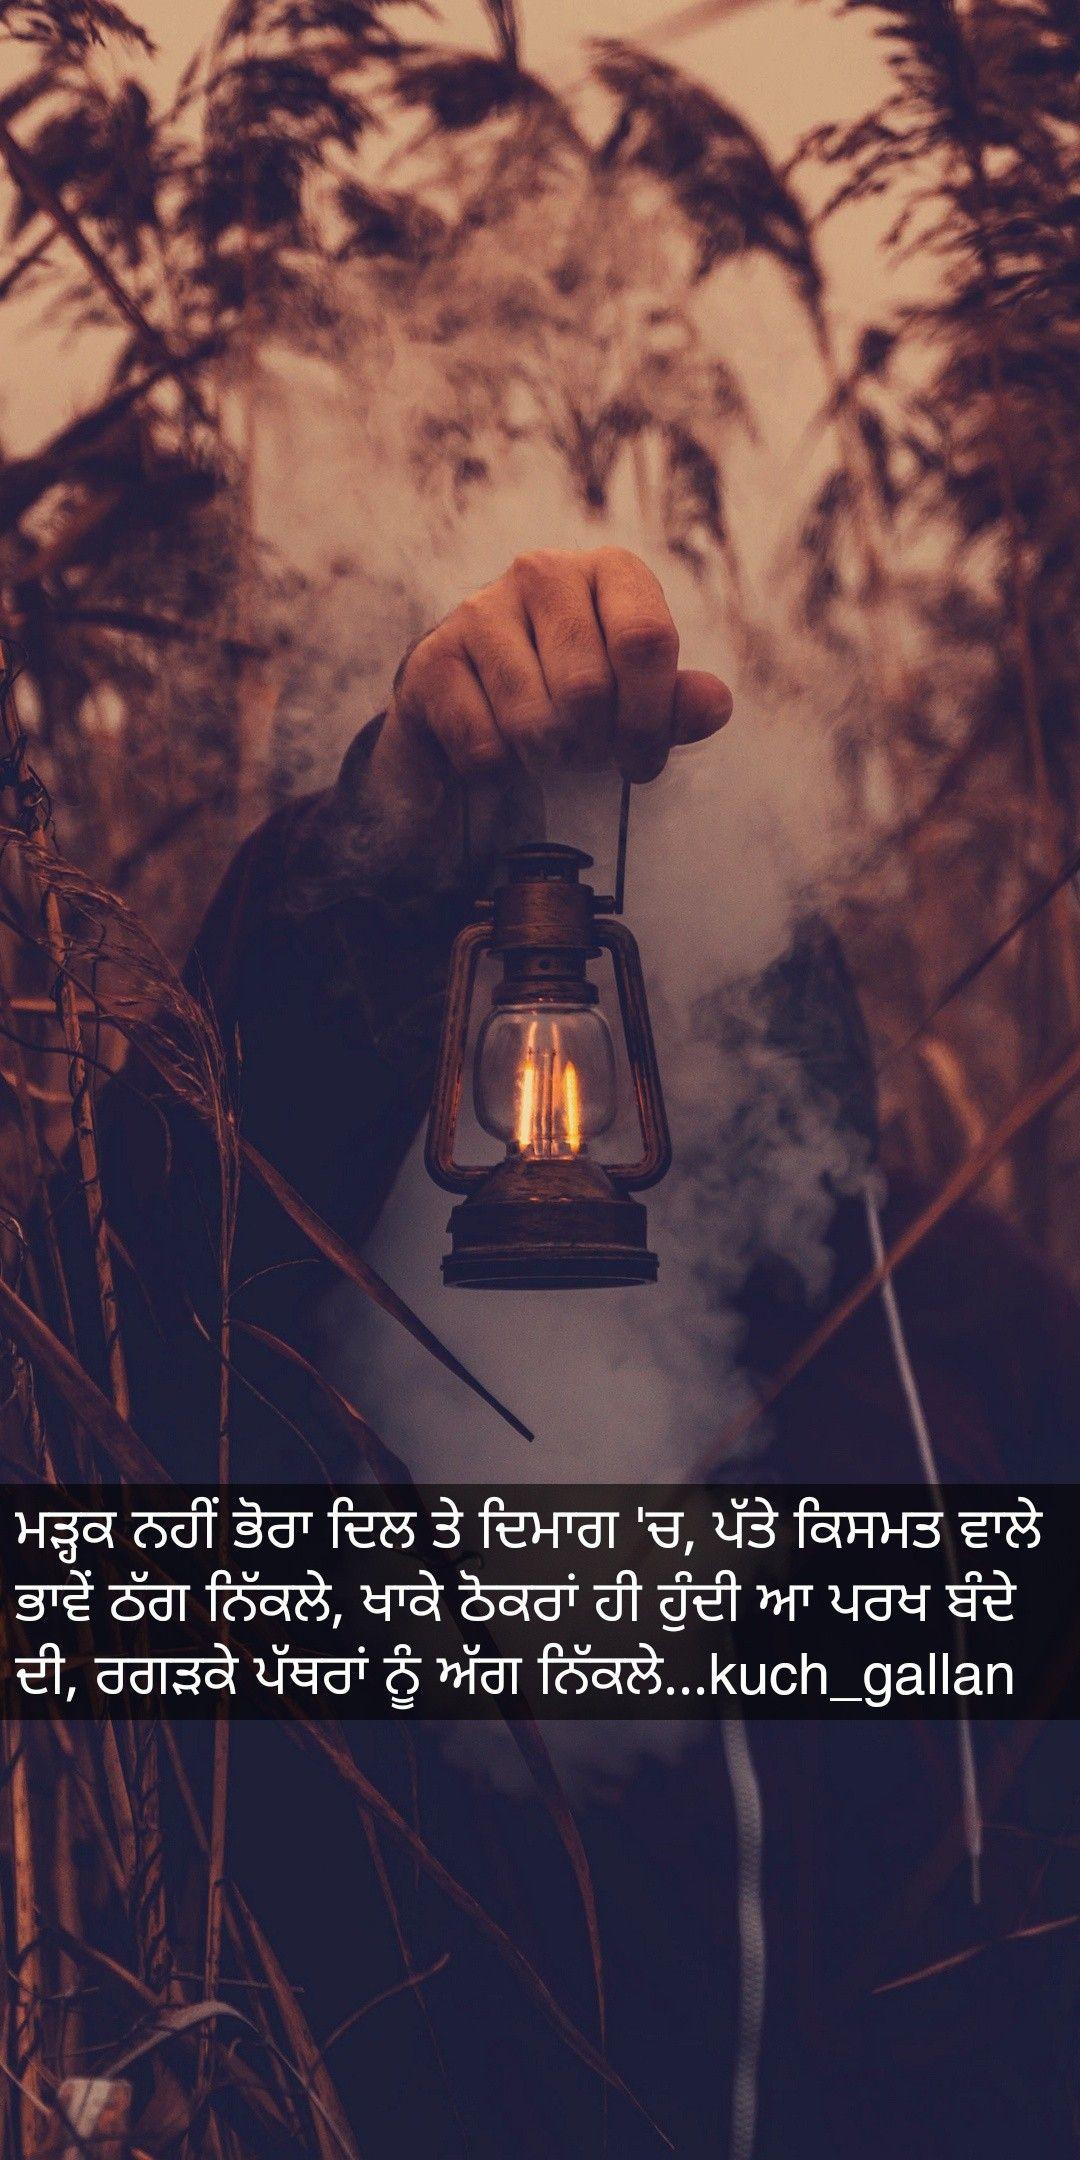 Punjabi shyari, motivational,life quotes on instagram ...